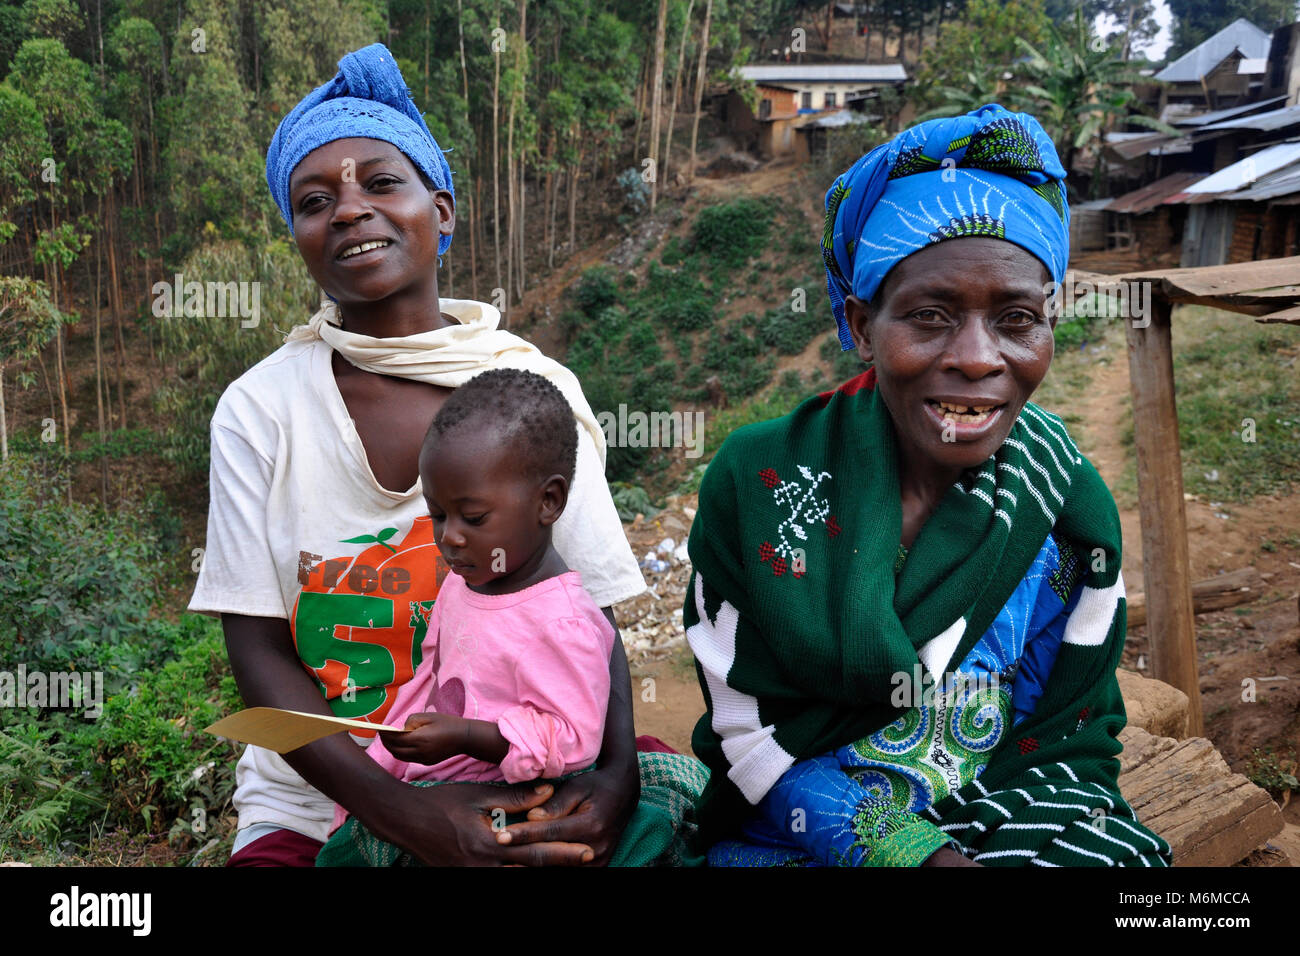 Rwanda, Gisakura Village - Stock Image